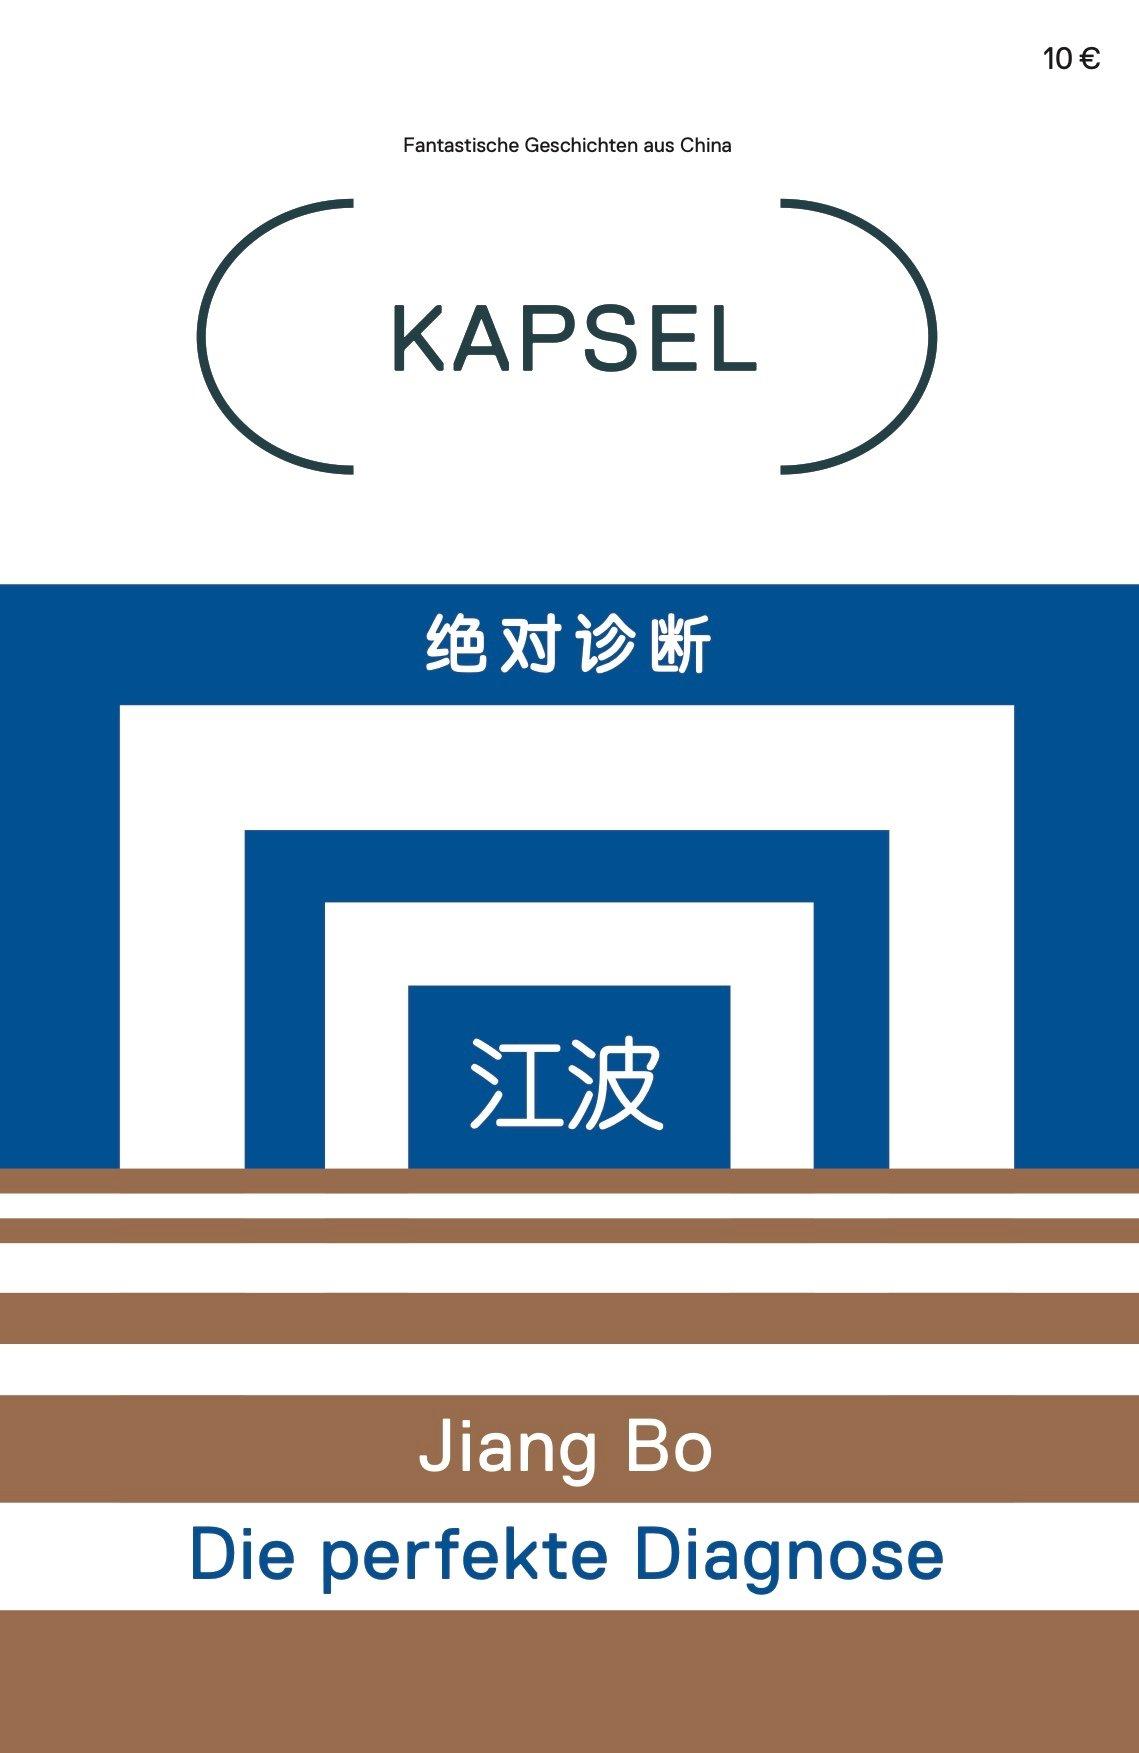 Image of Kapsel – Die perfekte Diagnose